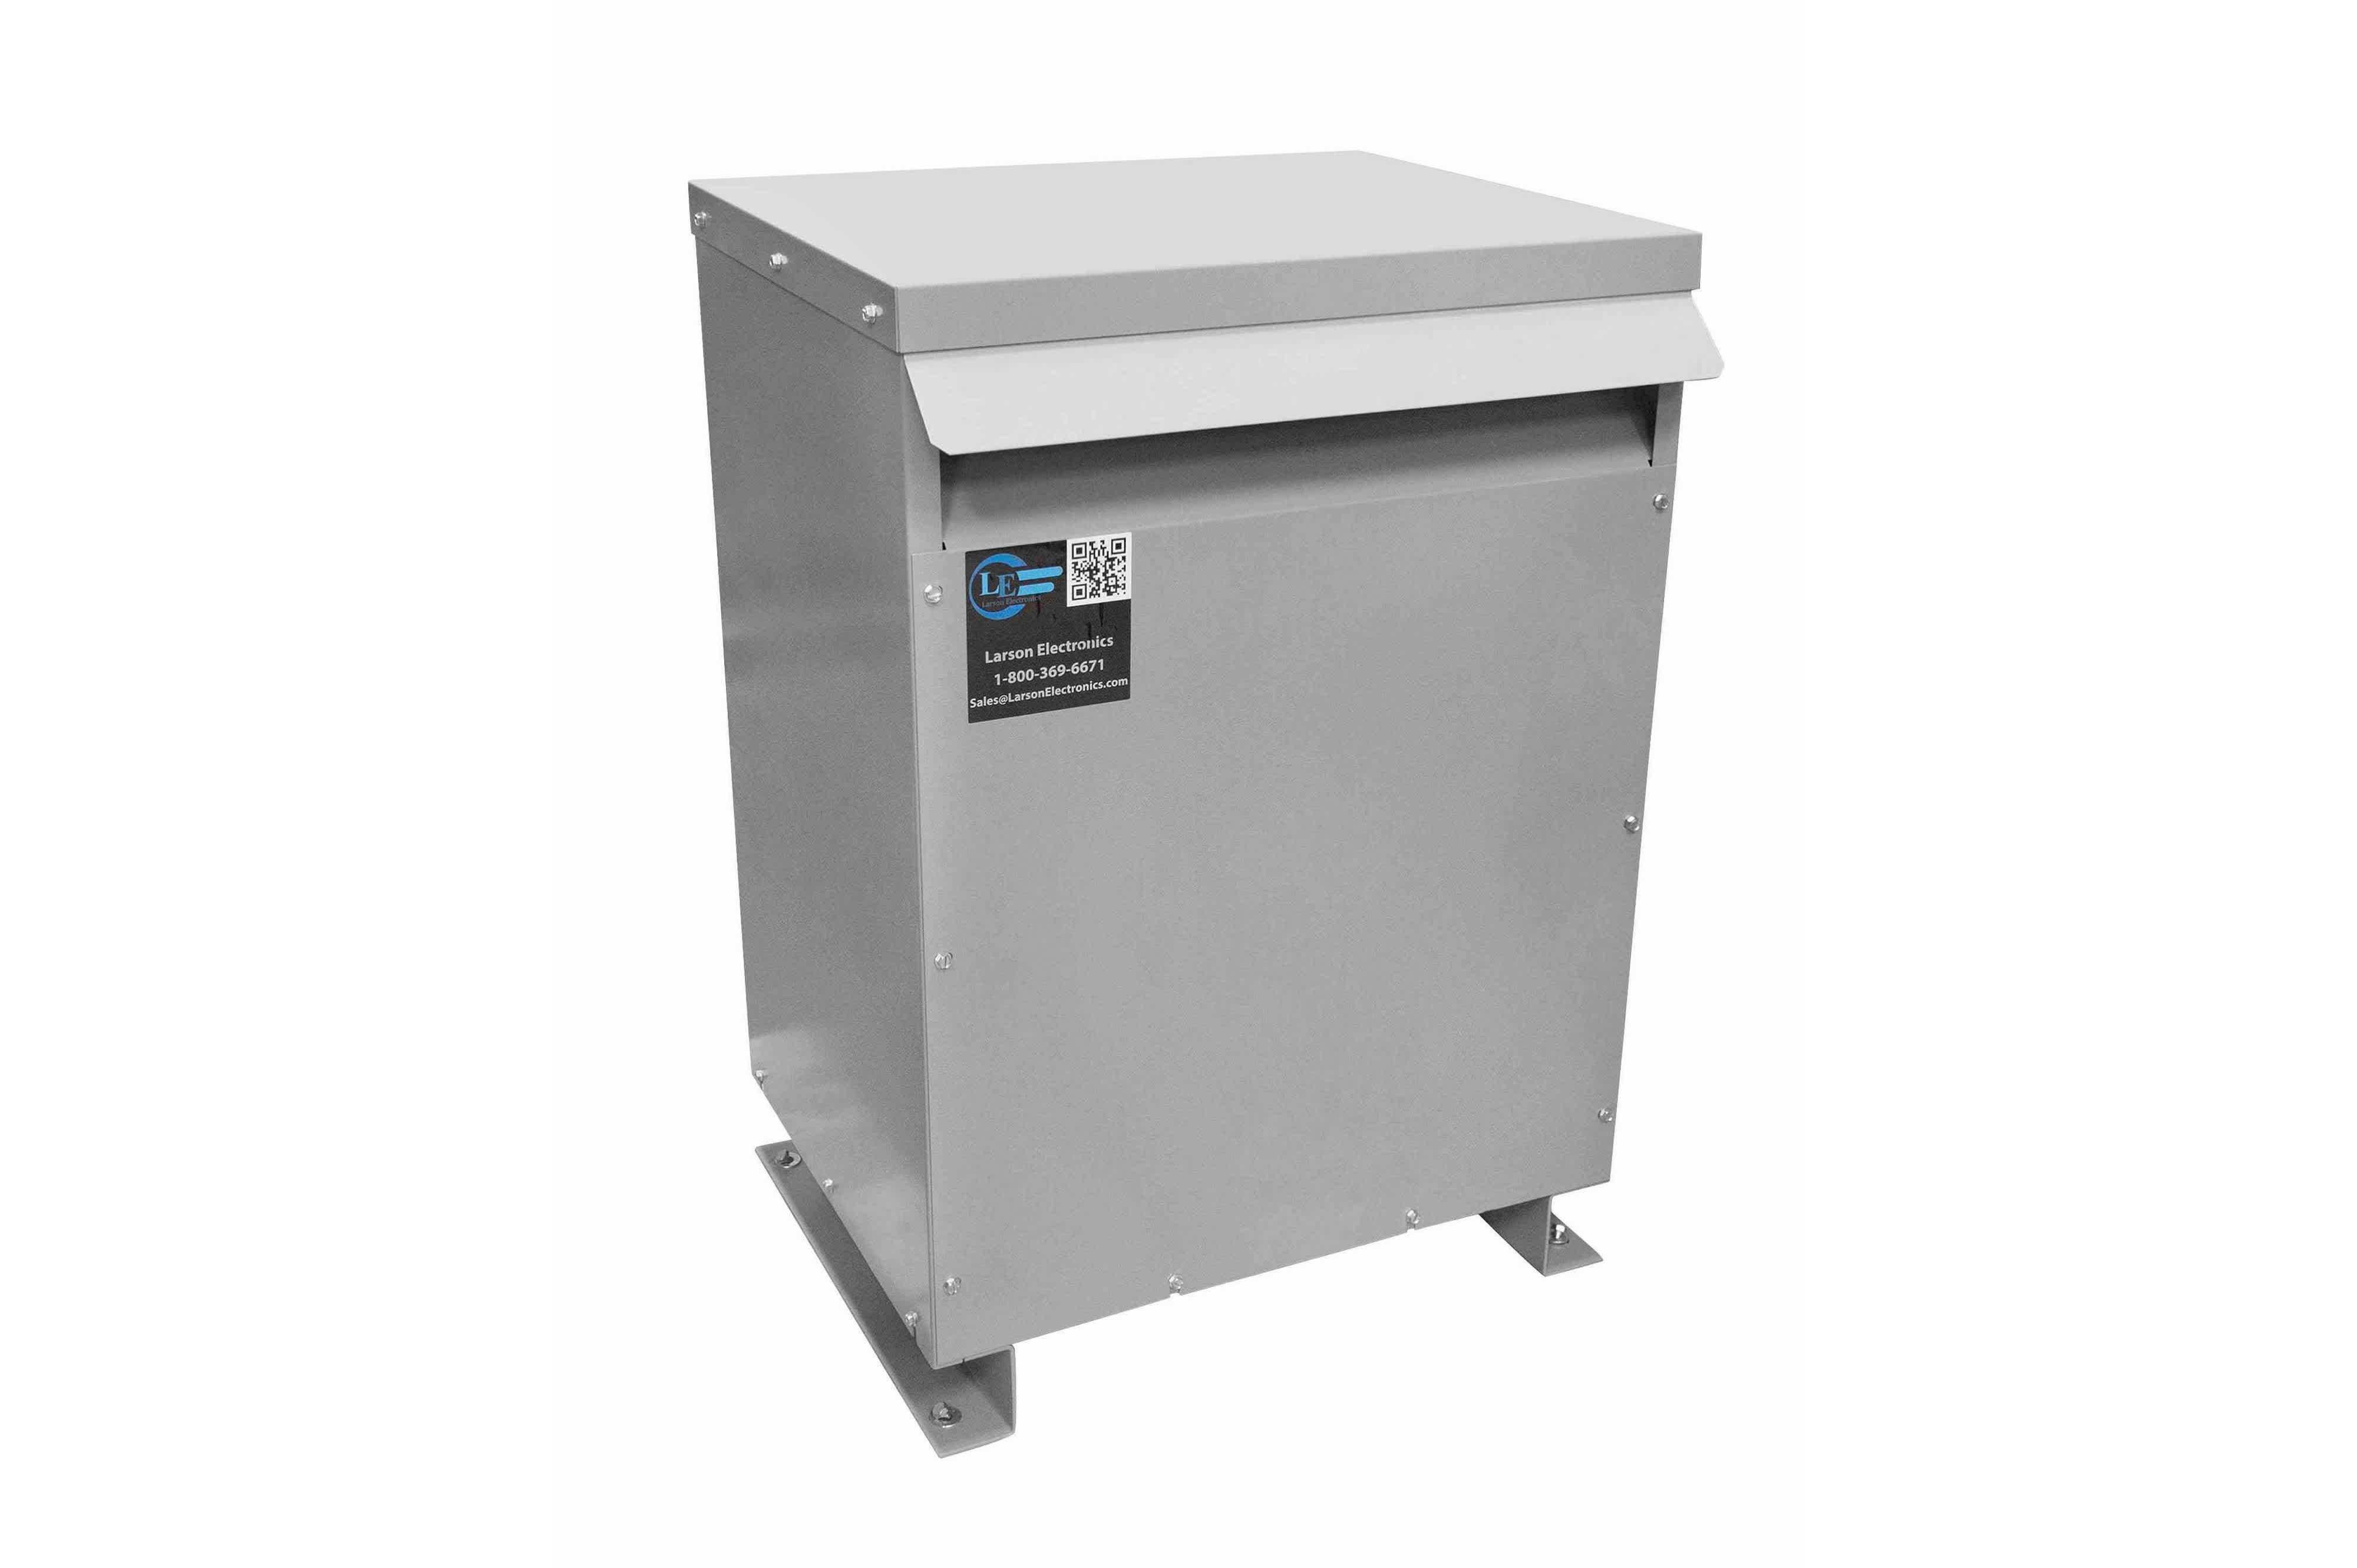 10 kVA 3PH Isolation Transformer, 400V Wye Primary, 600V Delta Secondary, N3R, Ventilated, 60 Hz